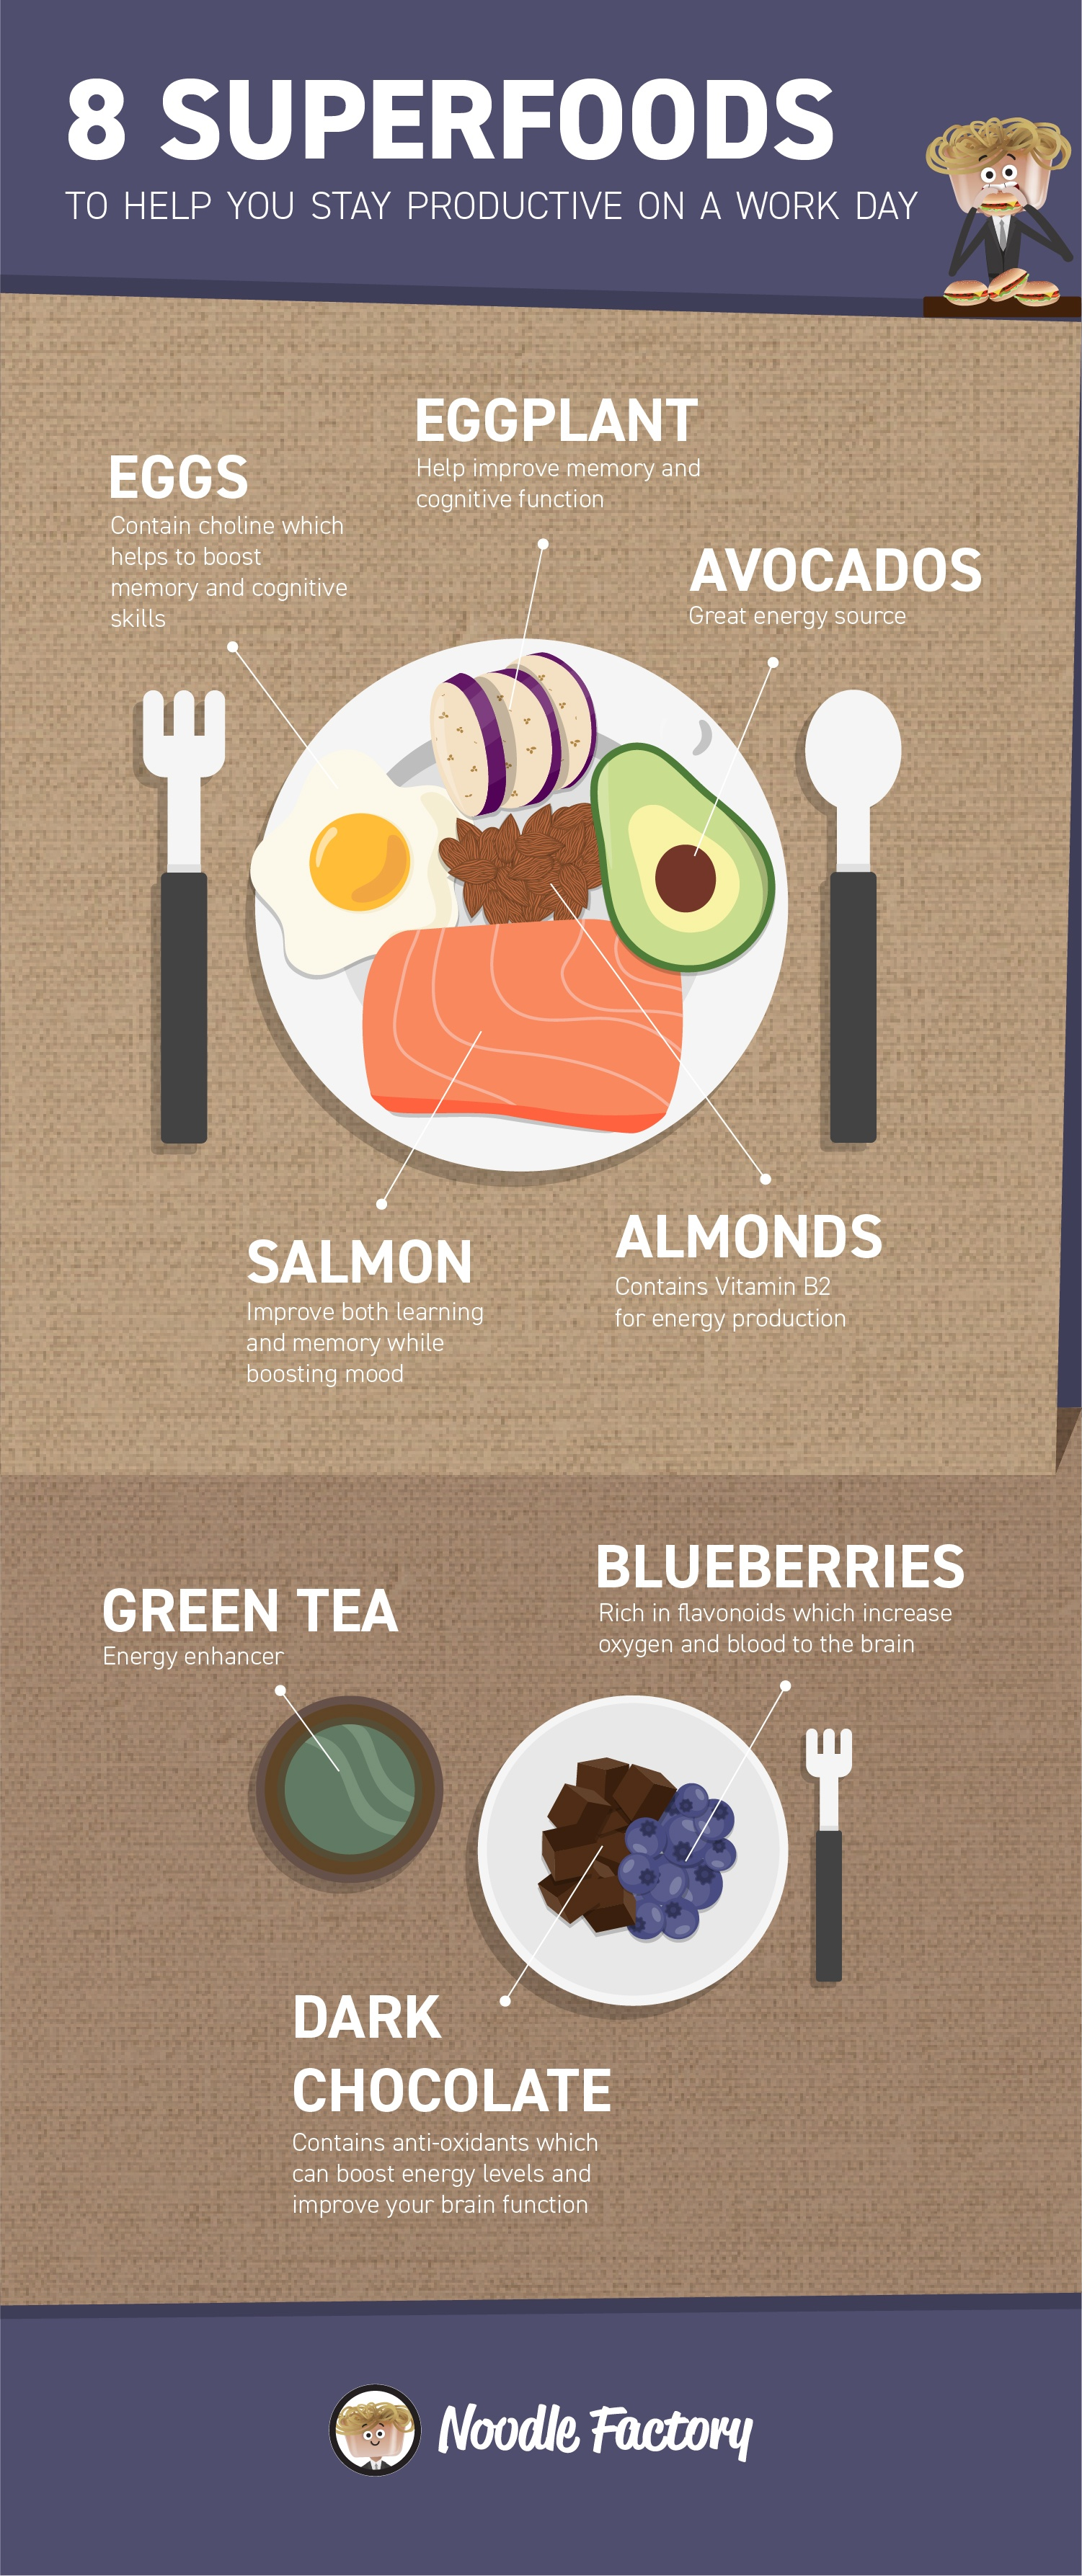 8-superfoods